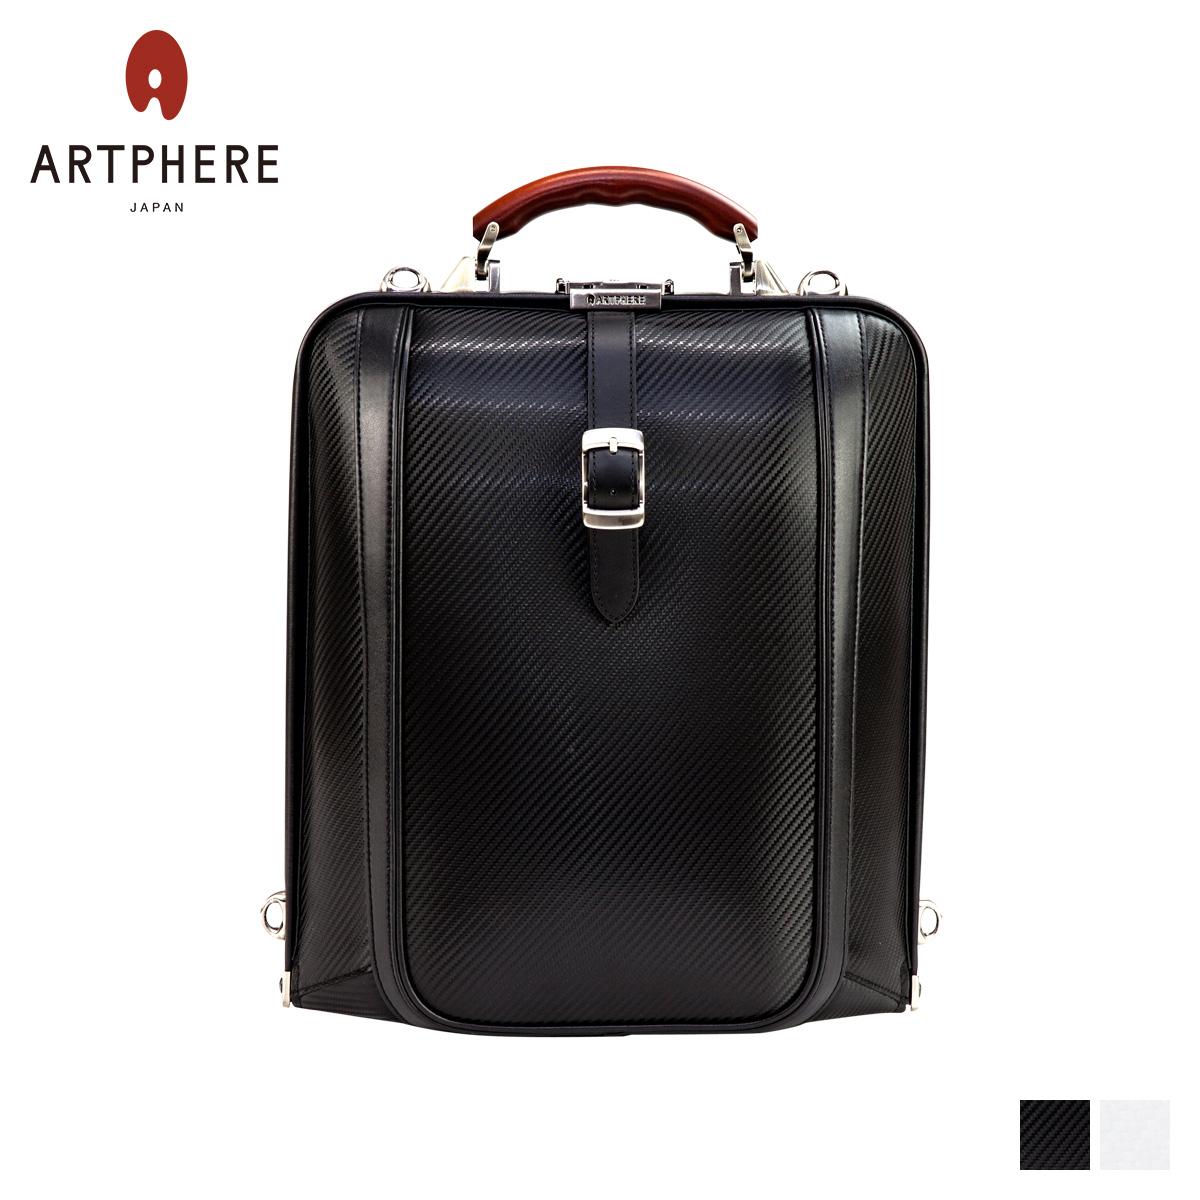 ARTPHERE アートフィアー リュック バッグ ビジネスバッグ バックパック ブリーフケース ニューダレス タッチ メンズ 3WAY NEW DULLES TOUCH ブラック ホワイト 黒 白 DS4-TE